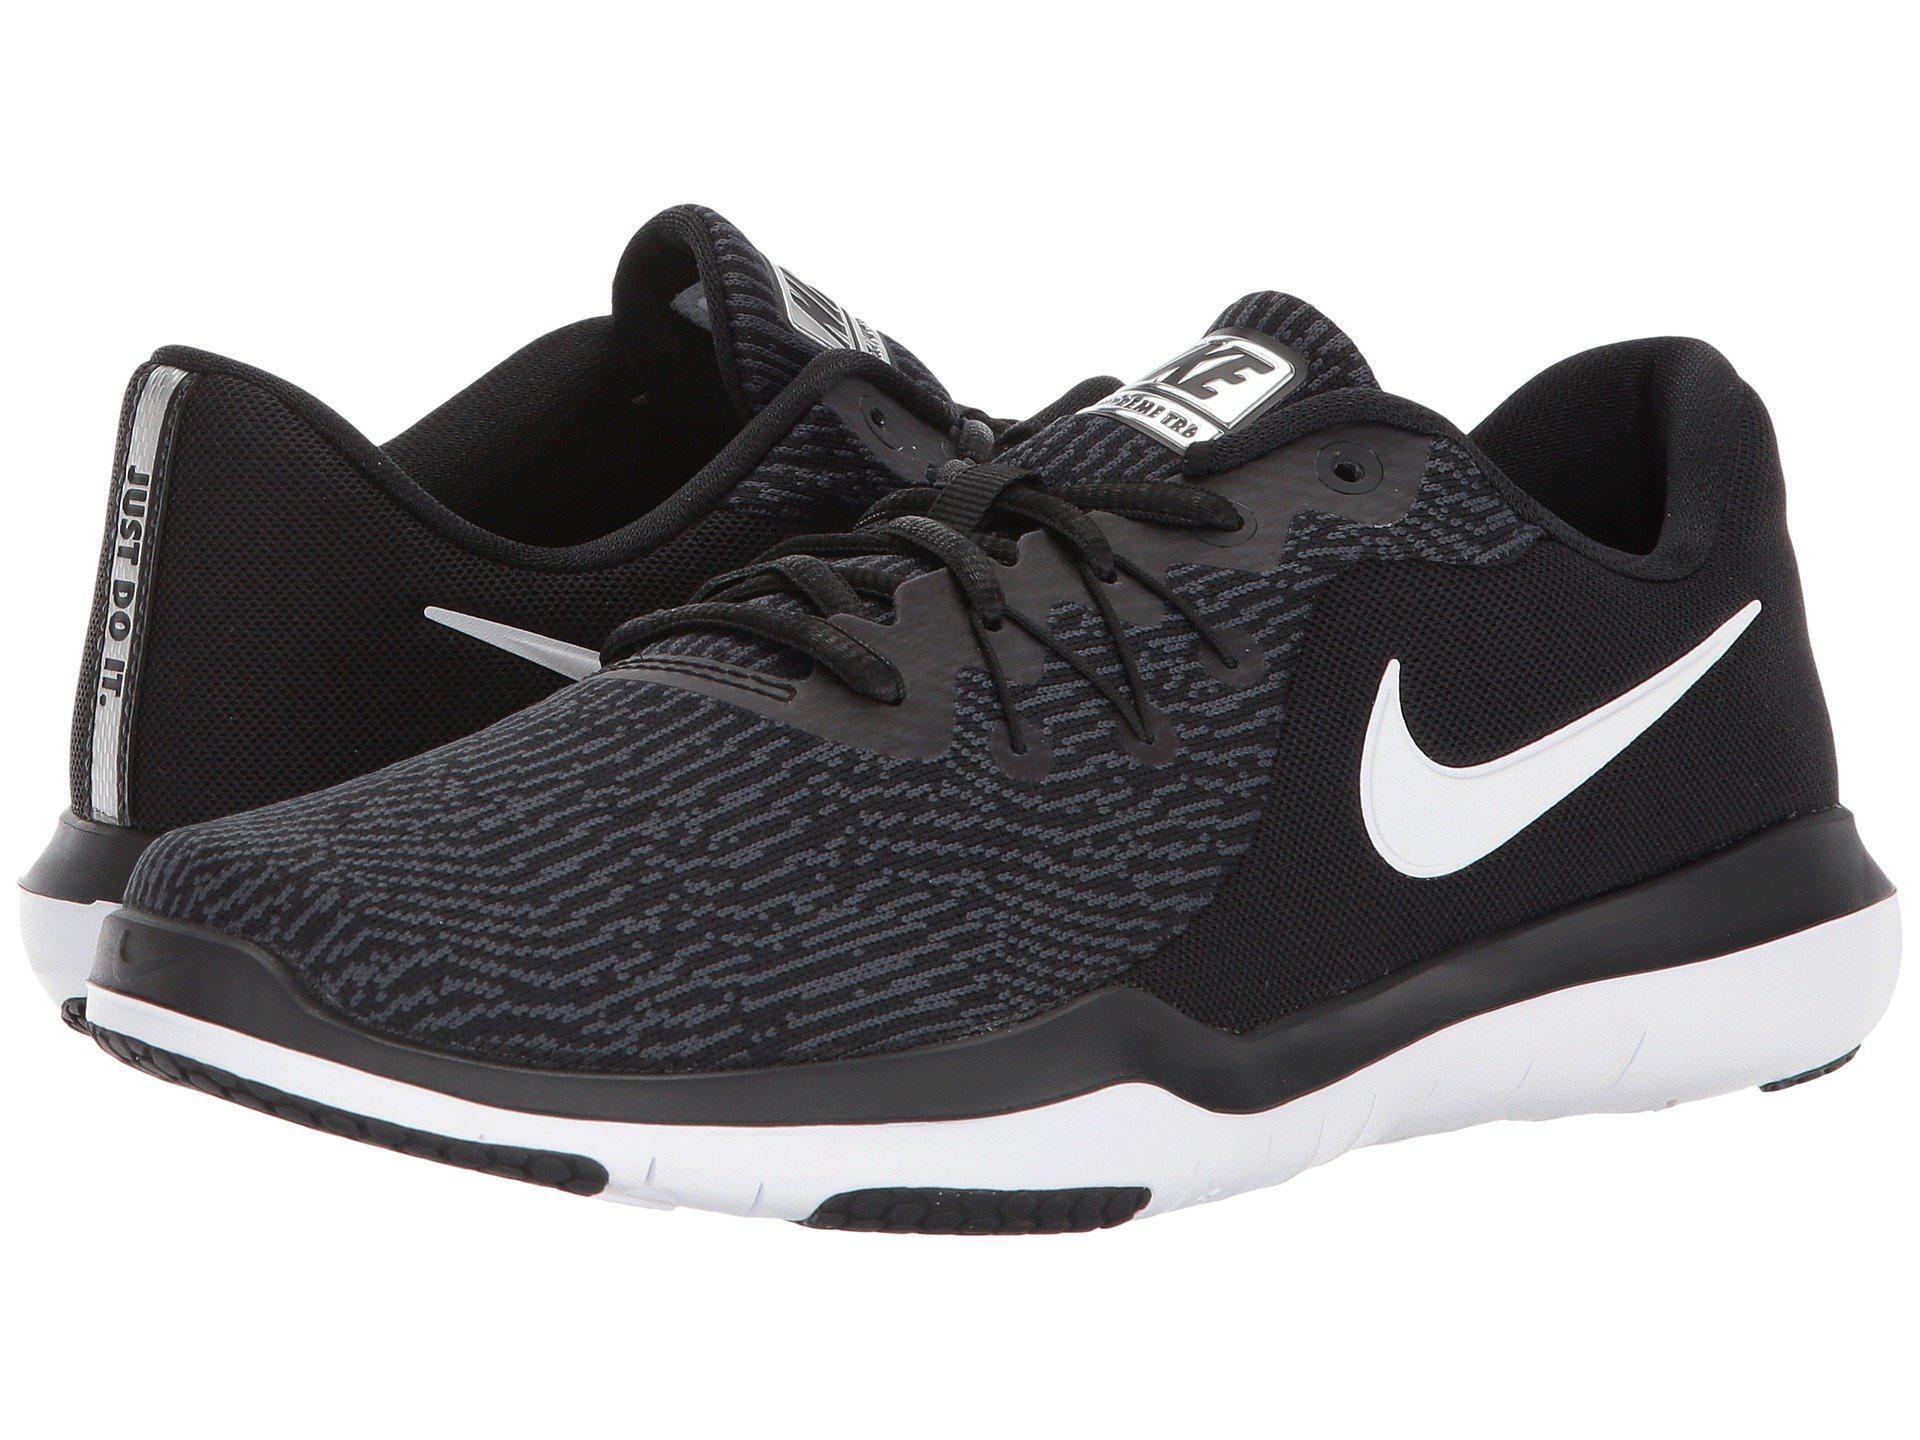 3f11d7aa3 Lyst - Nike Flex Supreme Tr 6 Training (black black anthracite ...